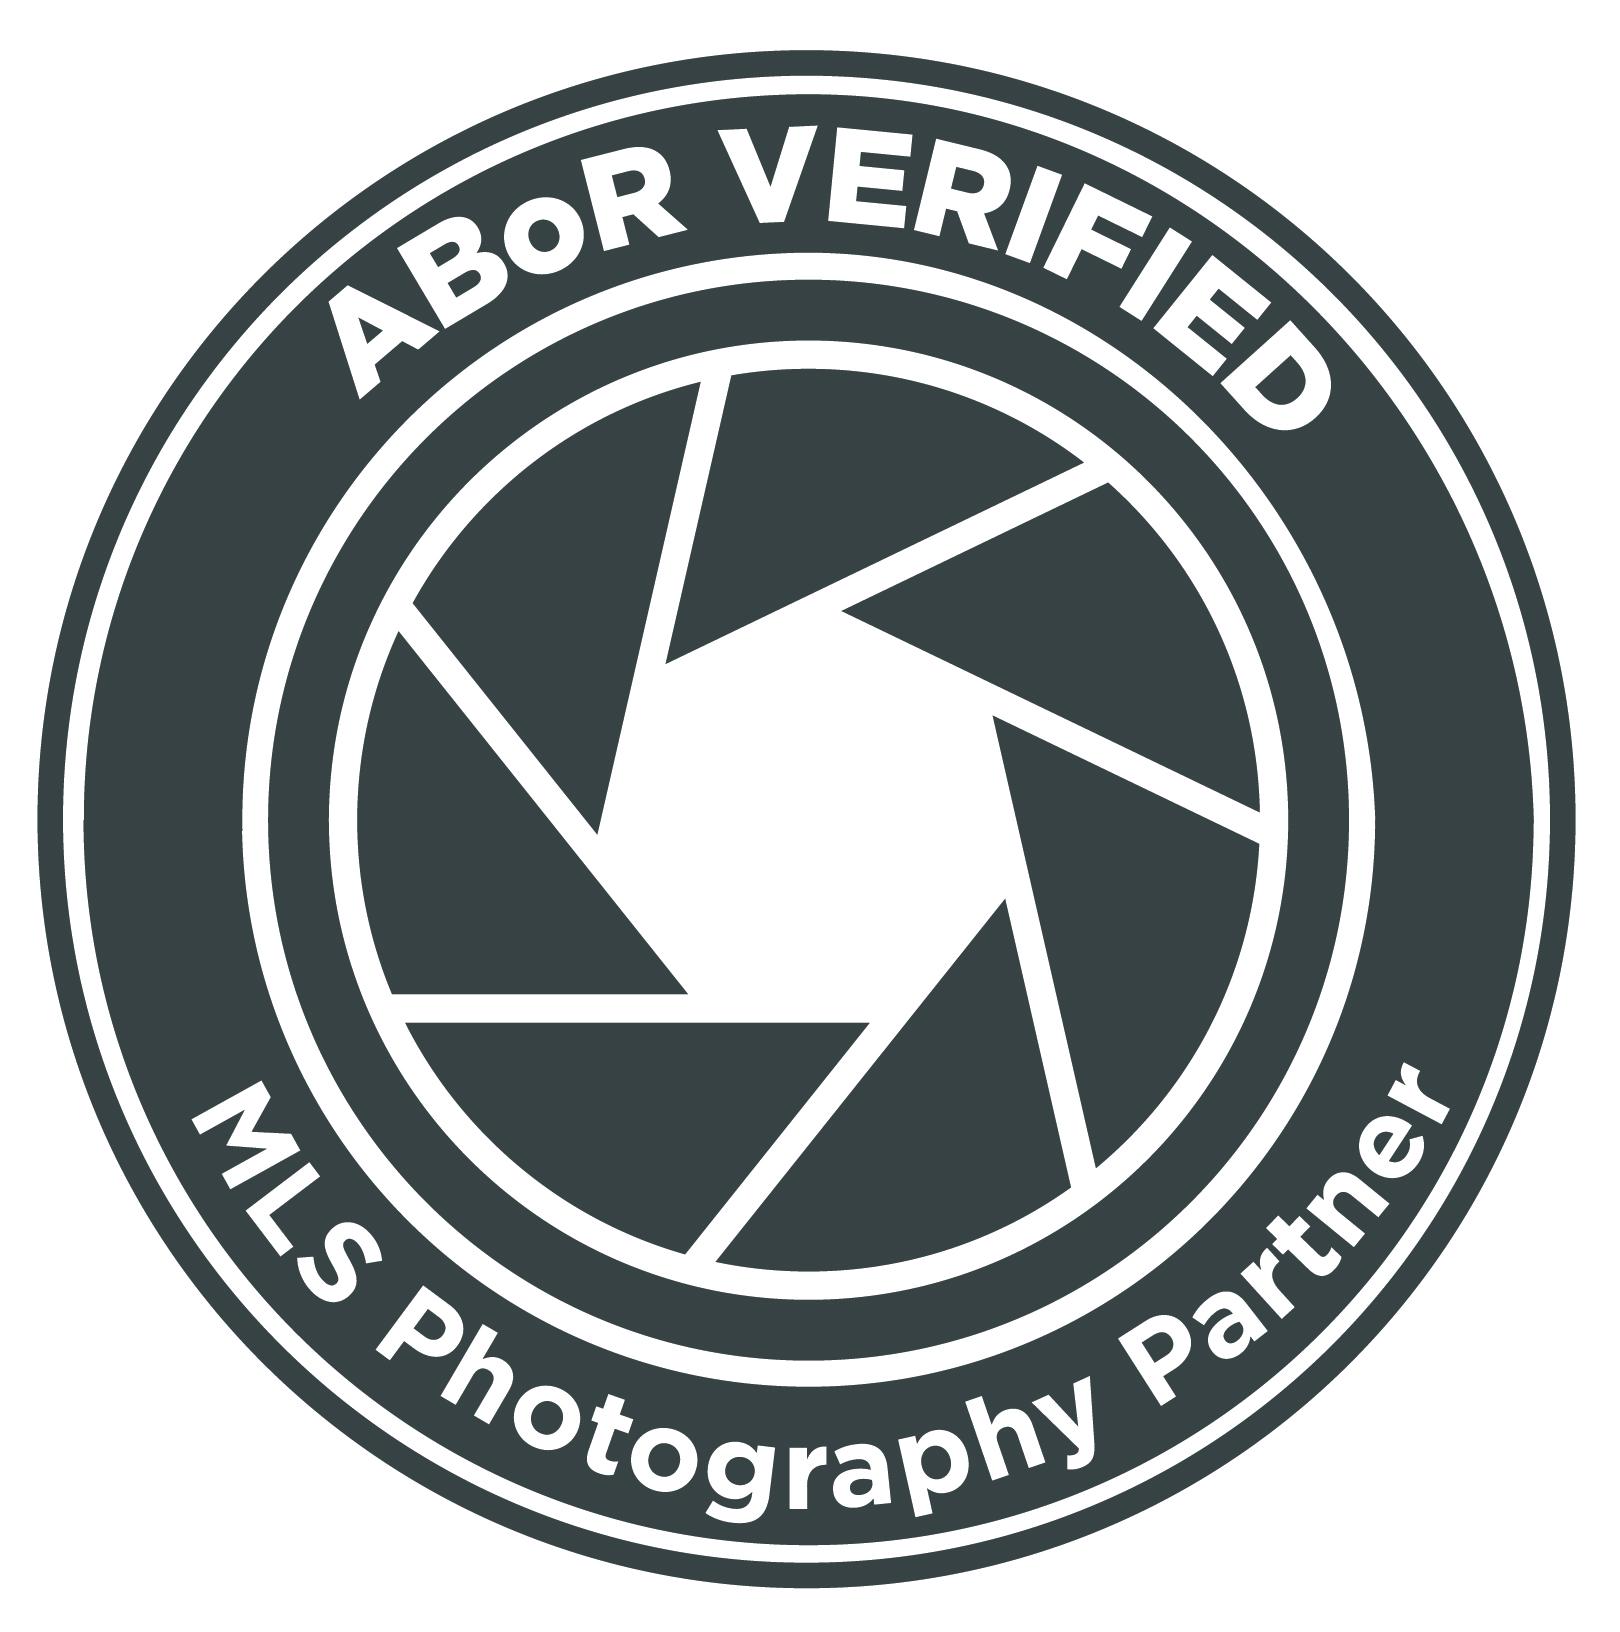 WEB_ABoR_Photography_Partner.jpg